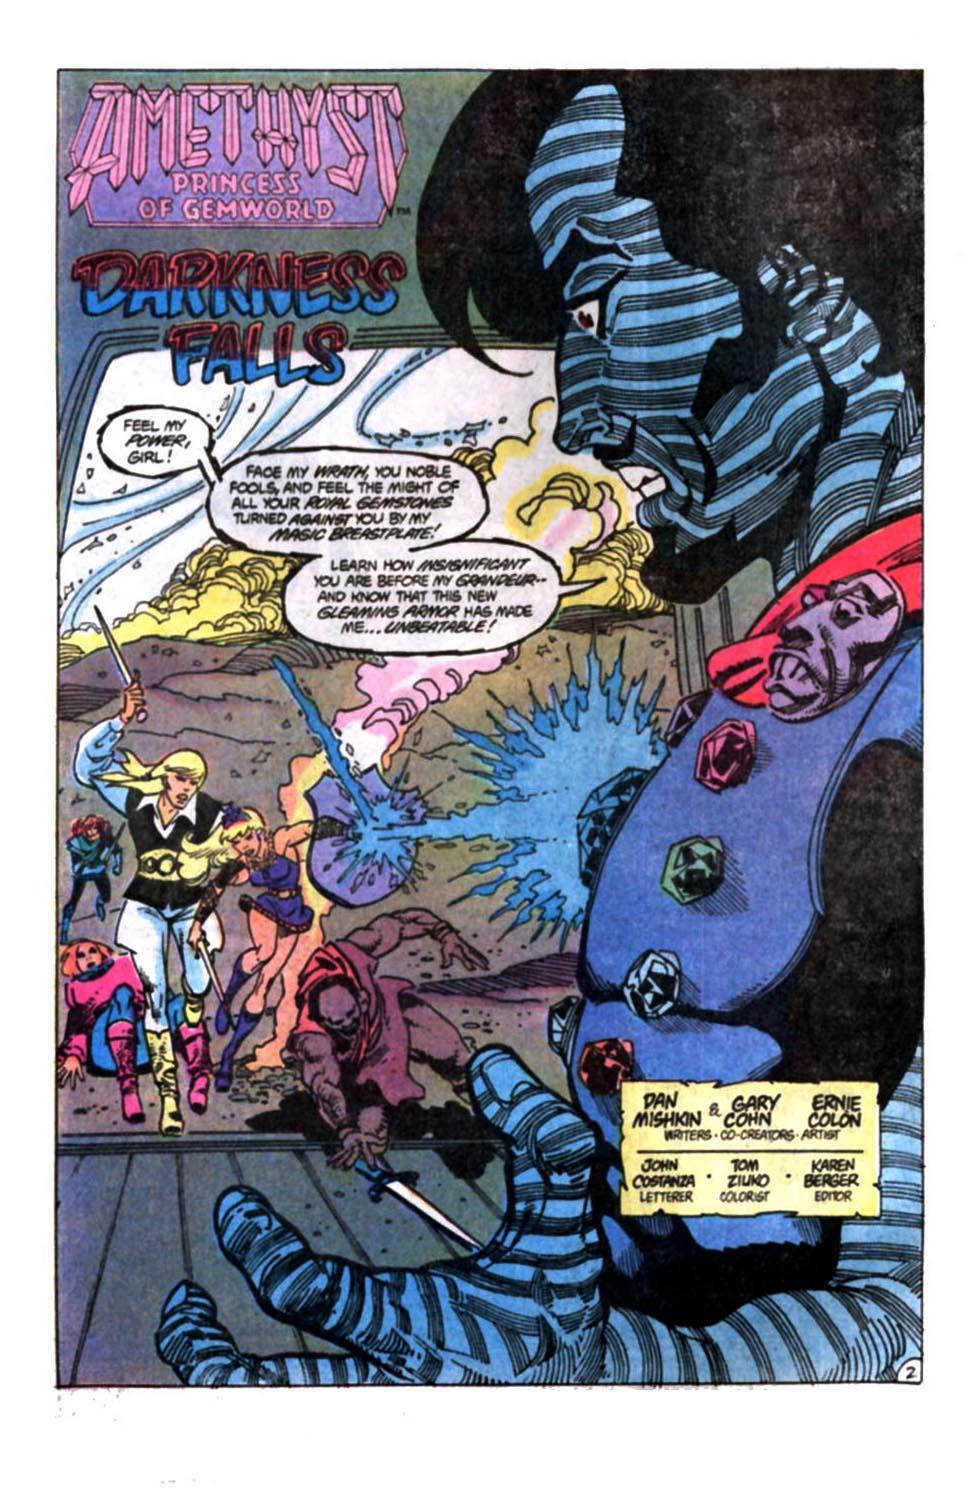 Read online Amethyst, Princess of Gemworld comic -  Issue #12 - 3